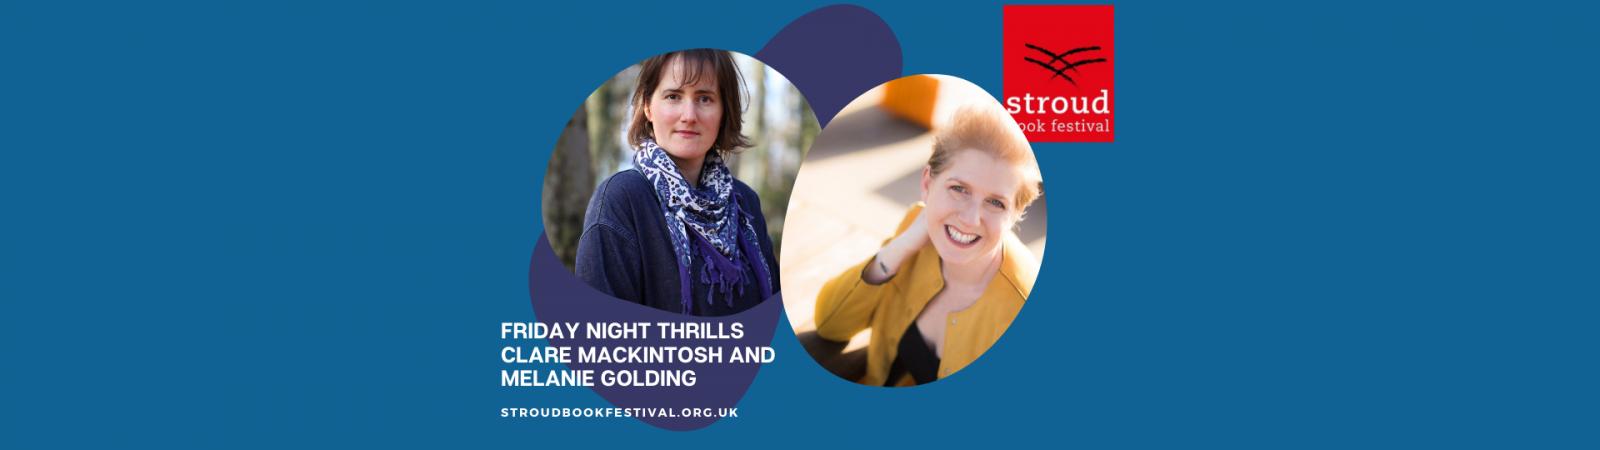 Friday Night Thrills, Clare Mackintosh & Melanie Golding